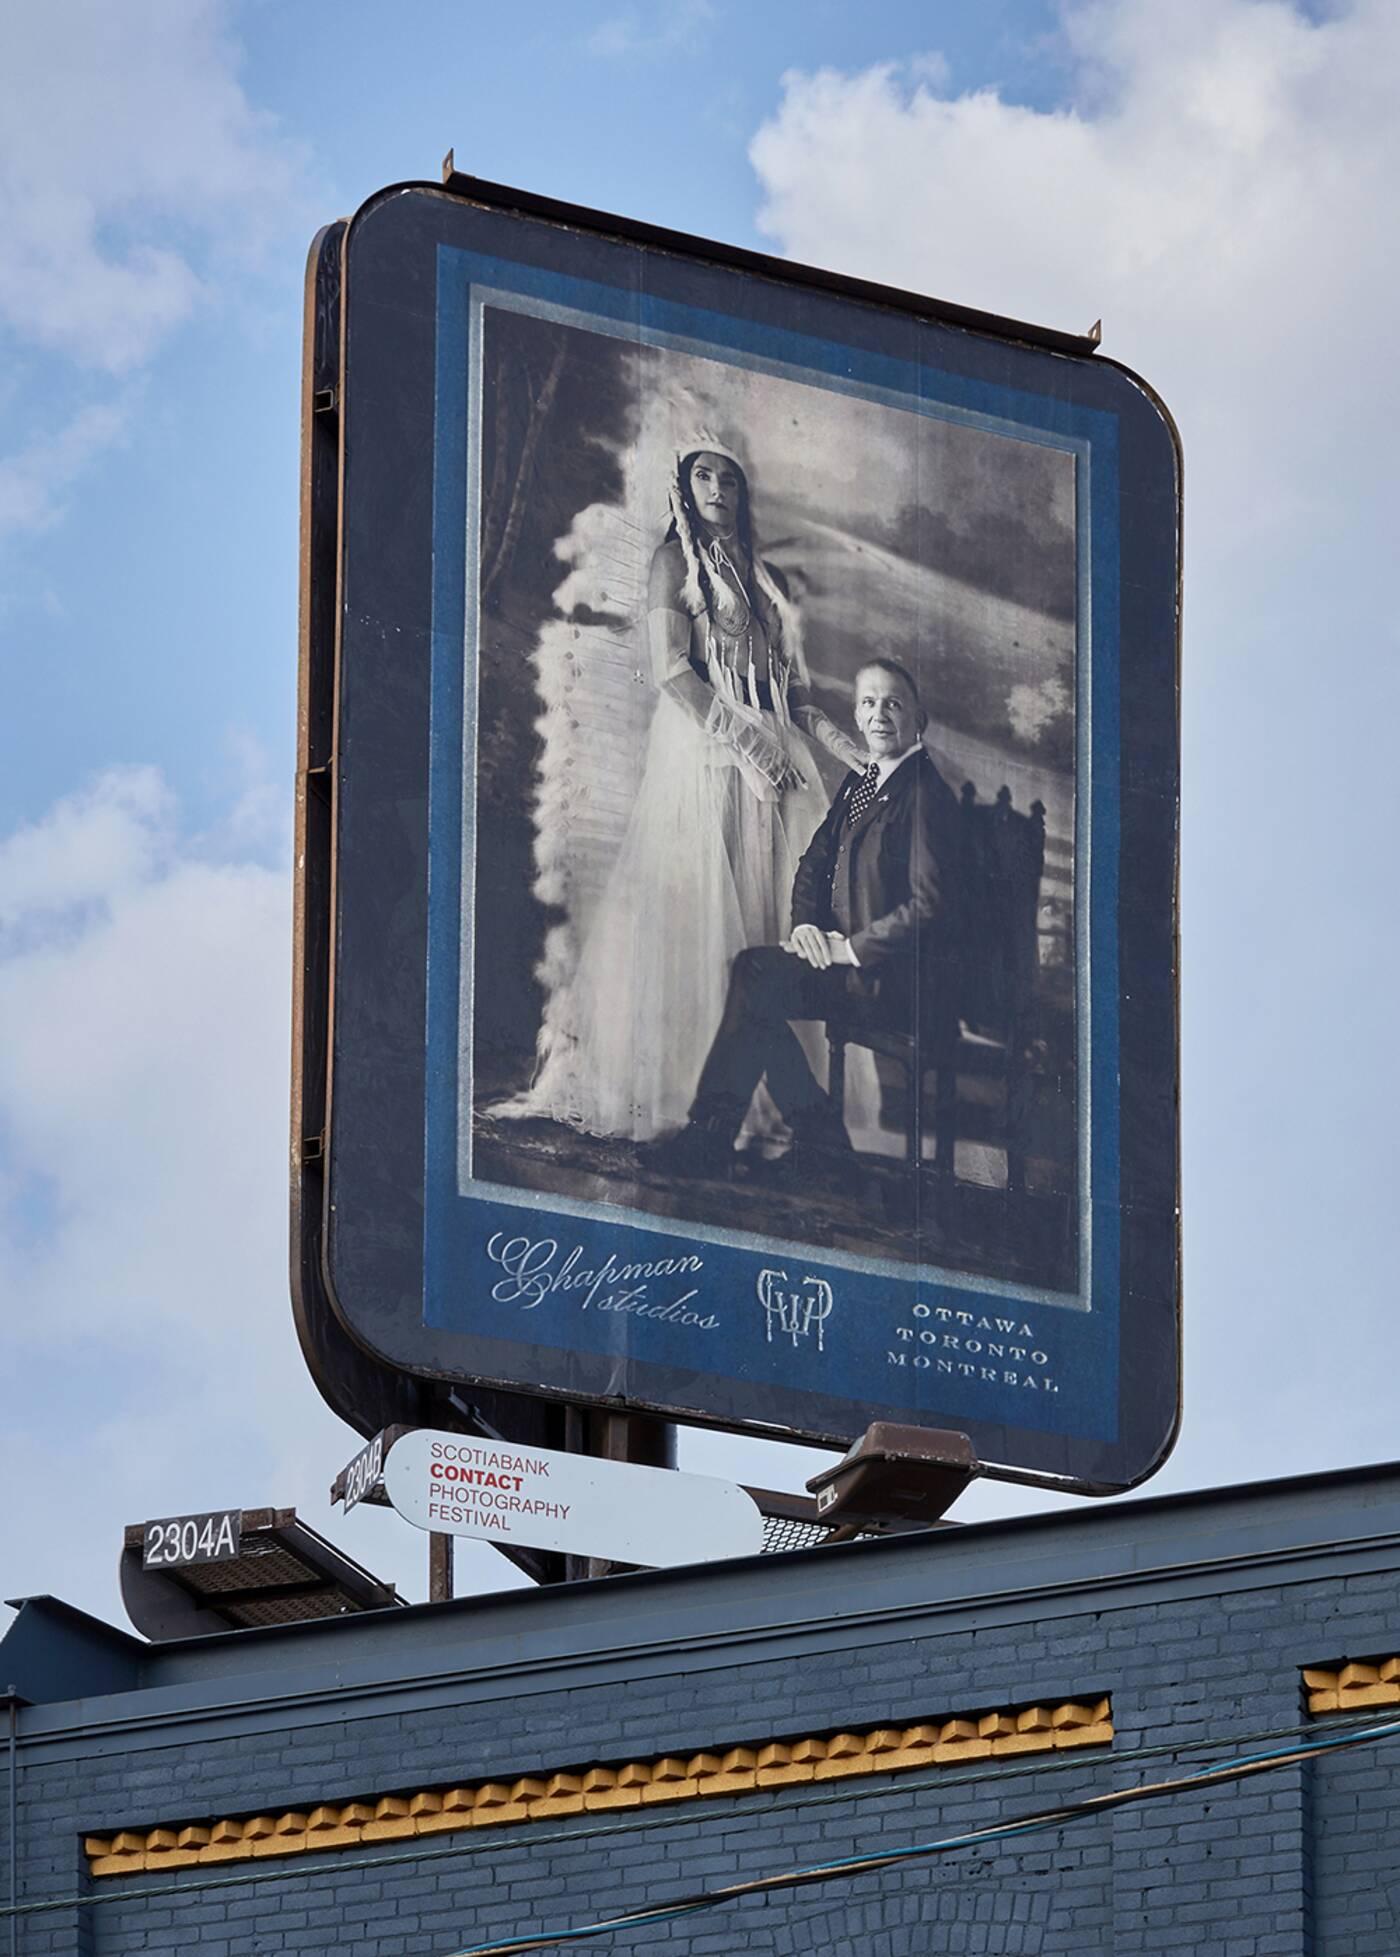 Kent Monkman billboard